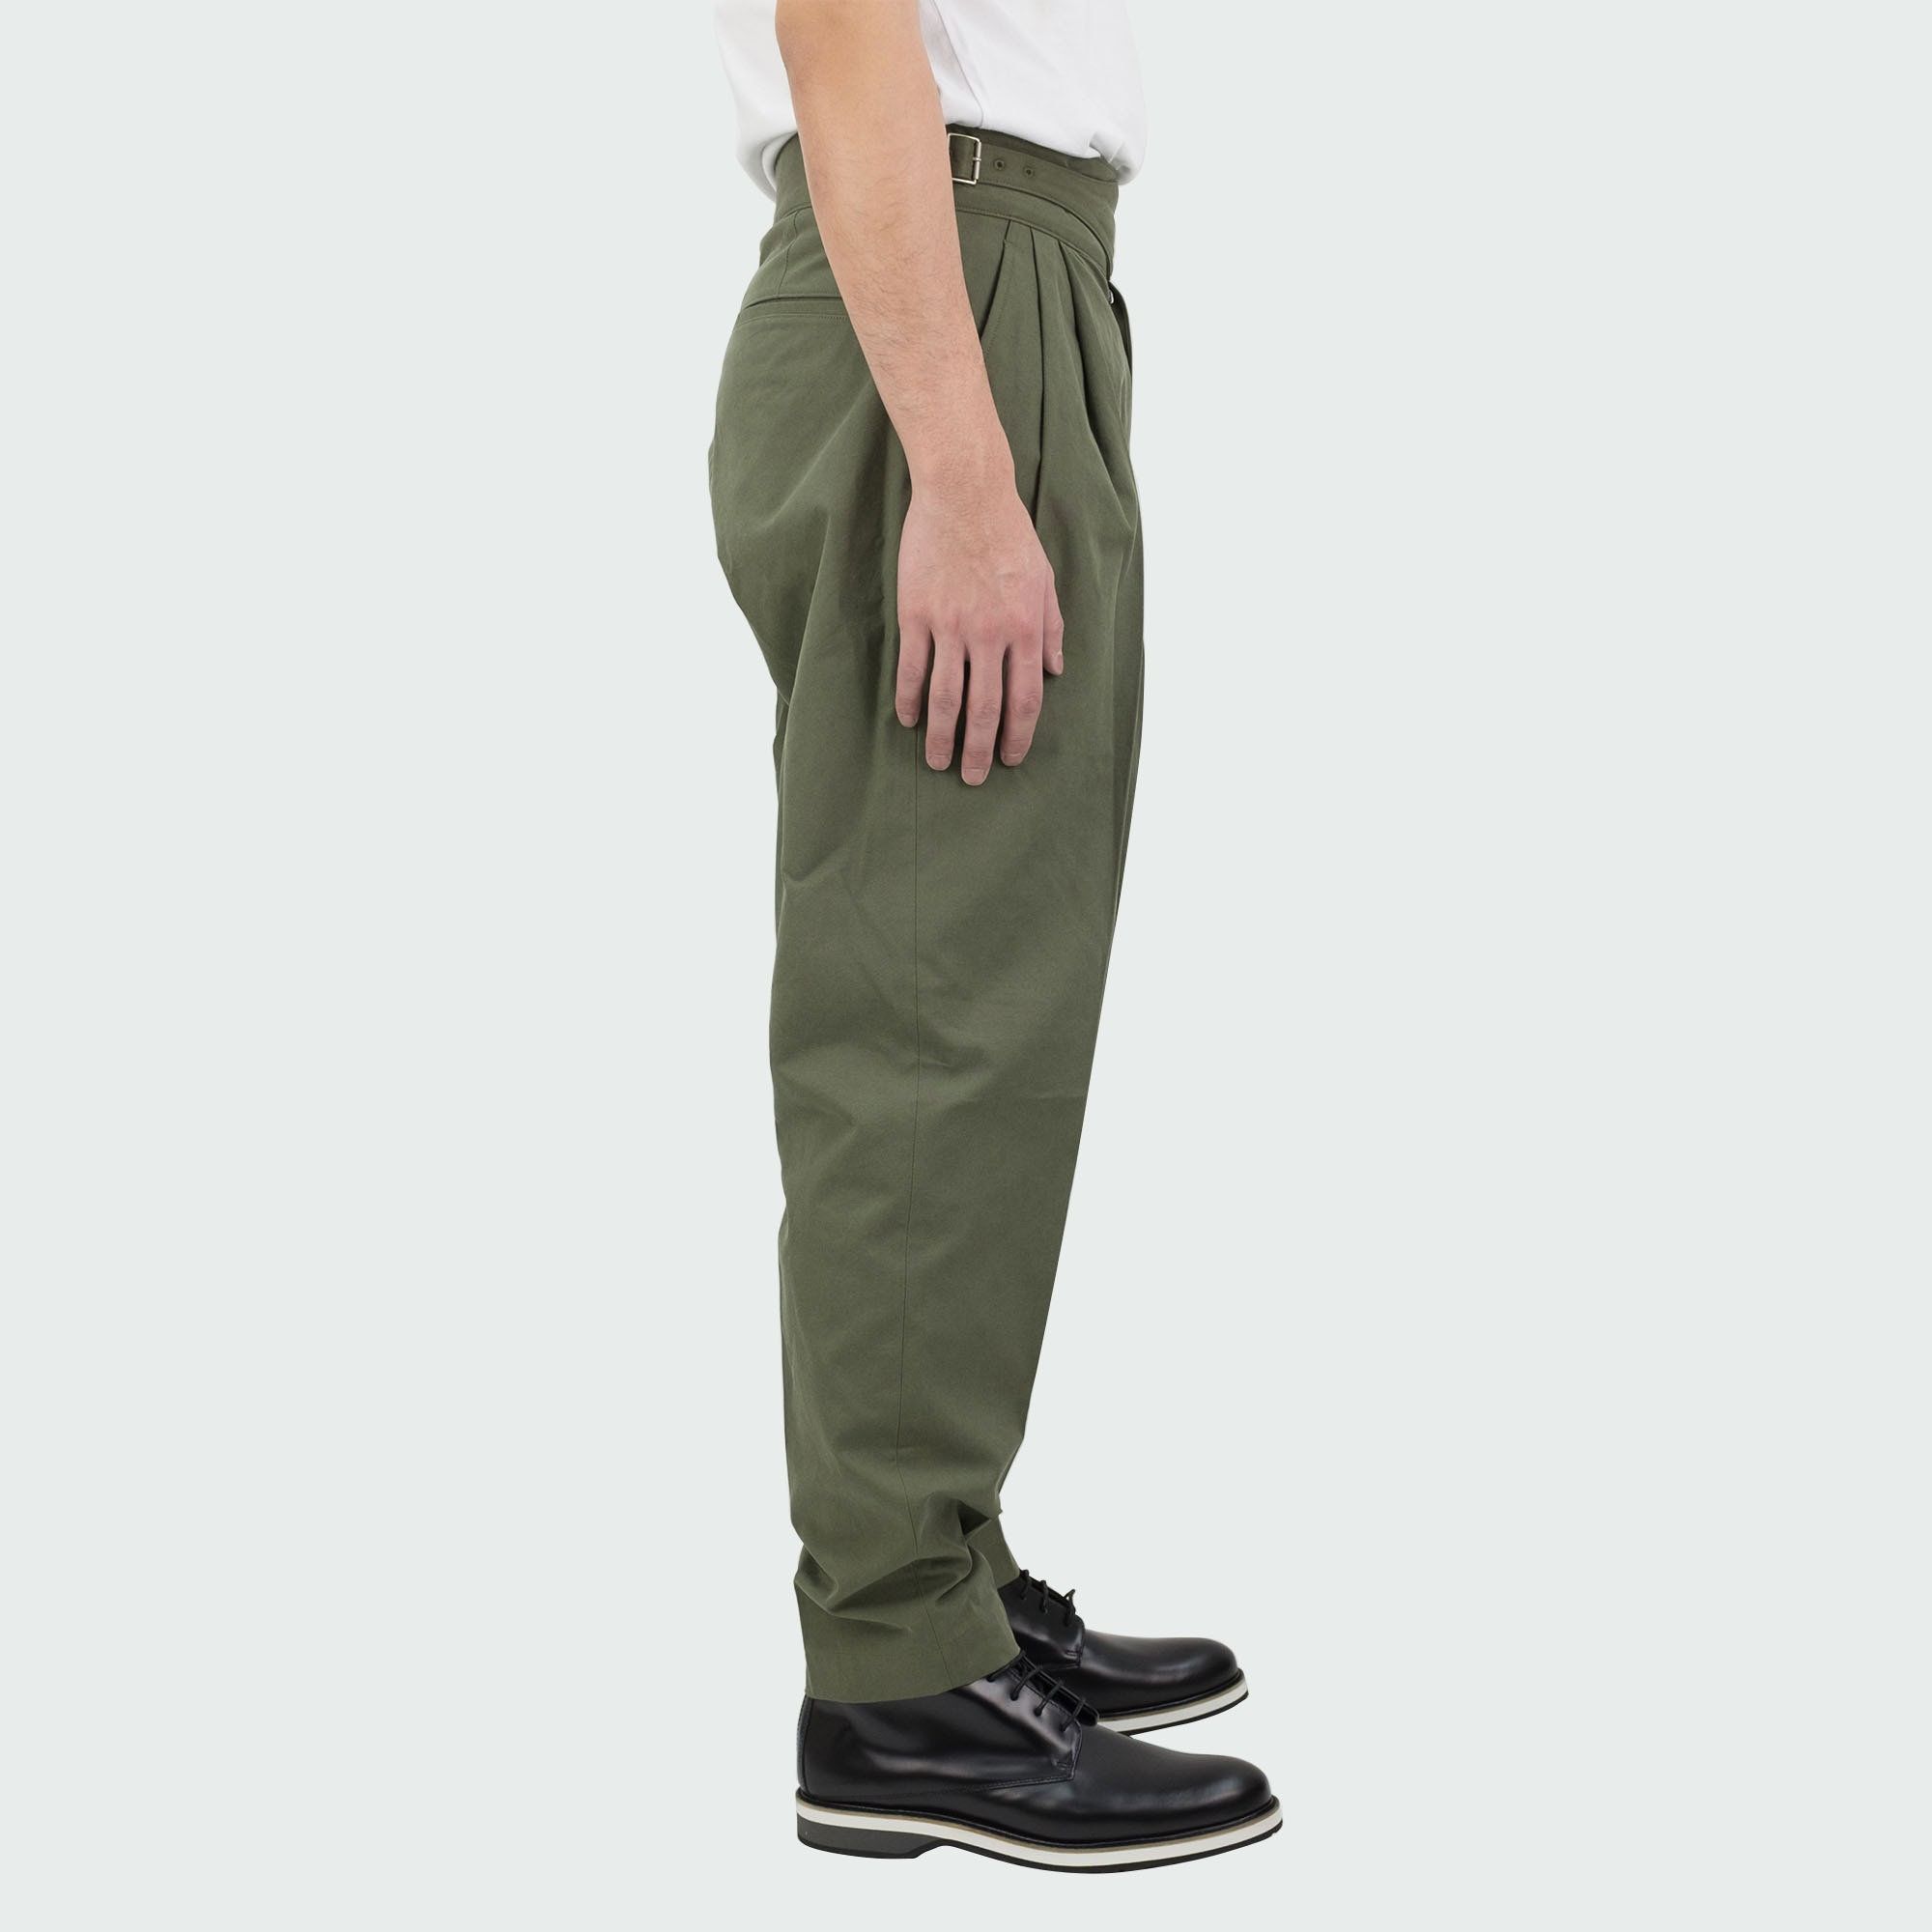 Sulfur Dyed NIDOM Gurkha Pants Khaki 3